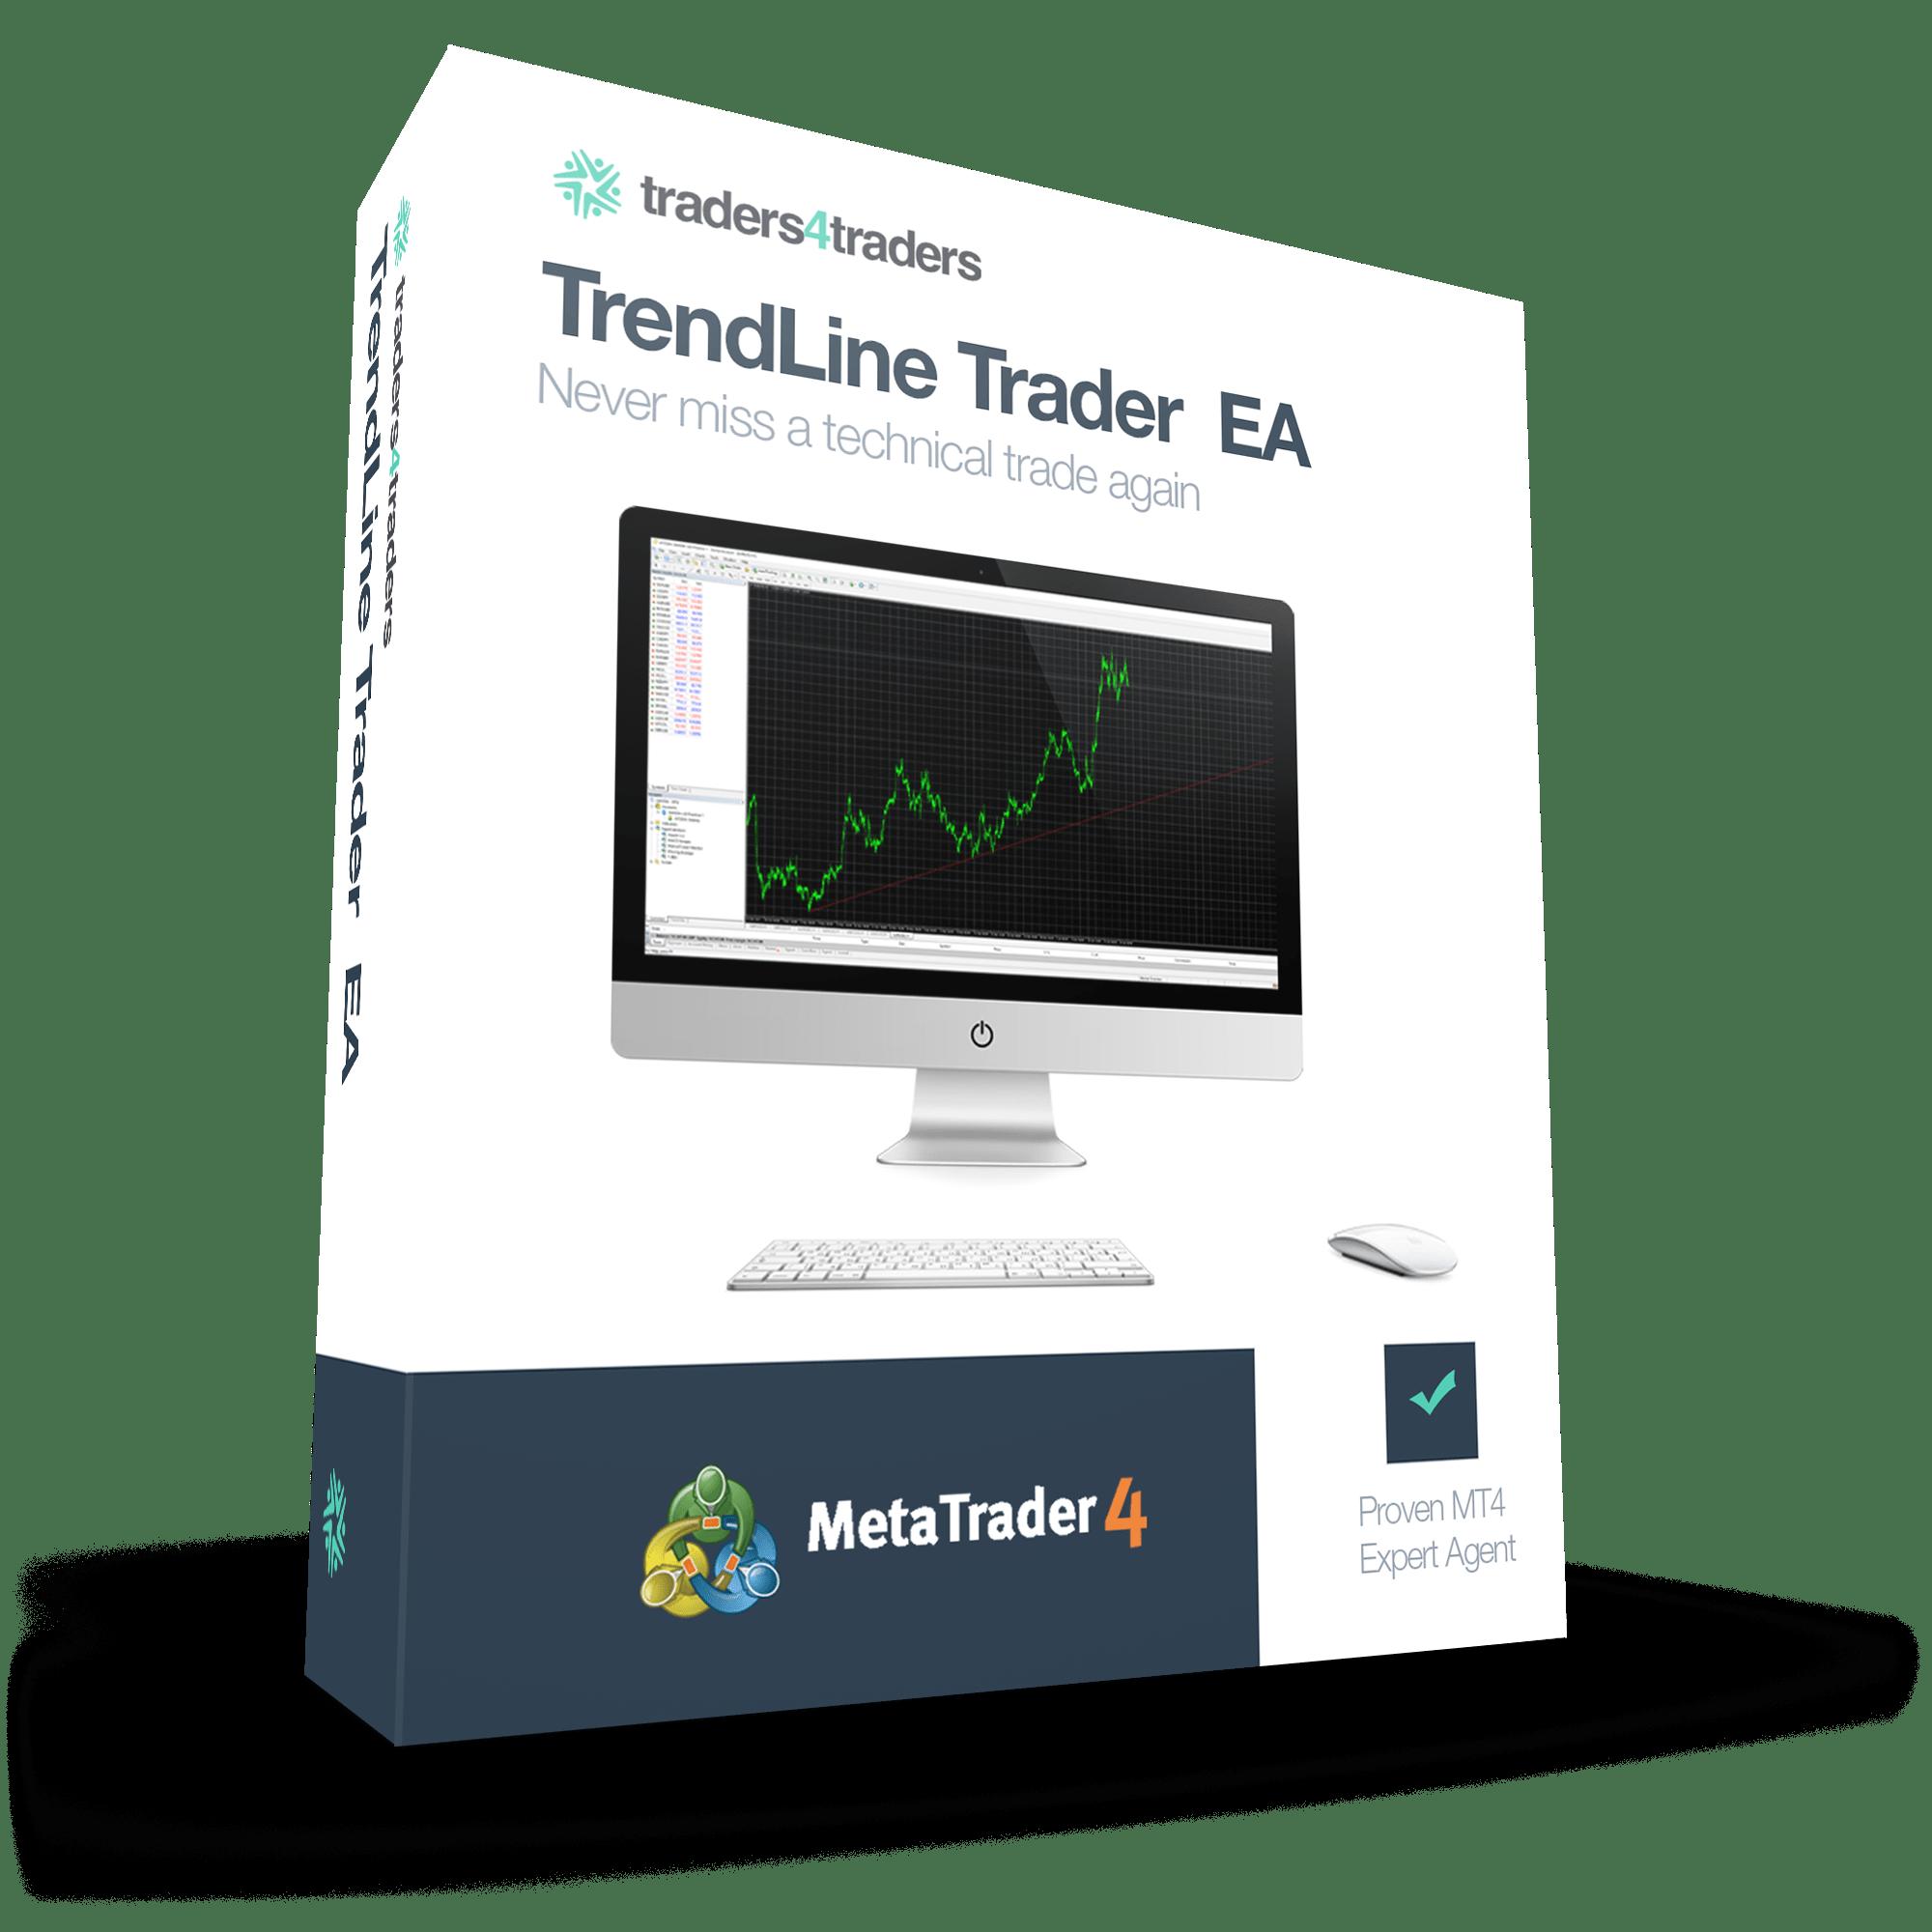 Trendline Trader